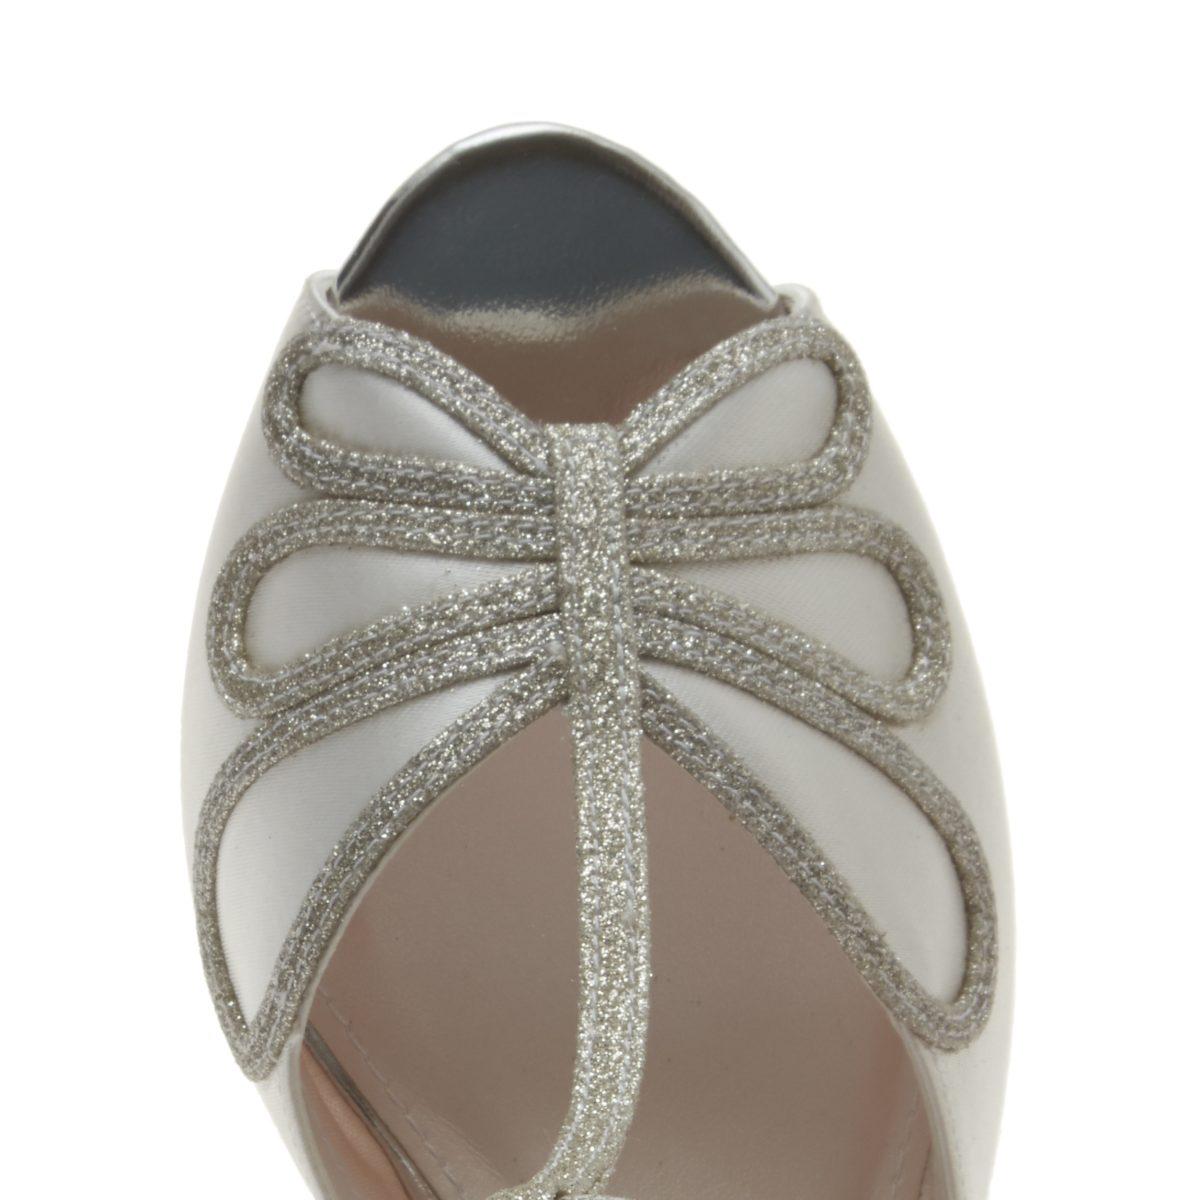 Rainbow Club Luciana - Peep Toe Satin/ Silver Shimmer Shoe 3